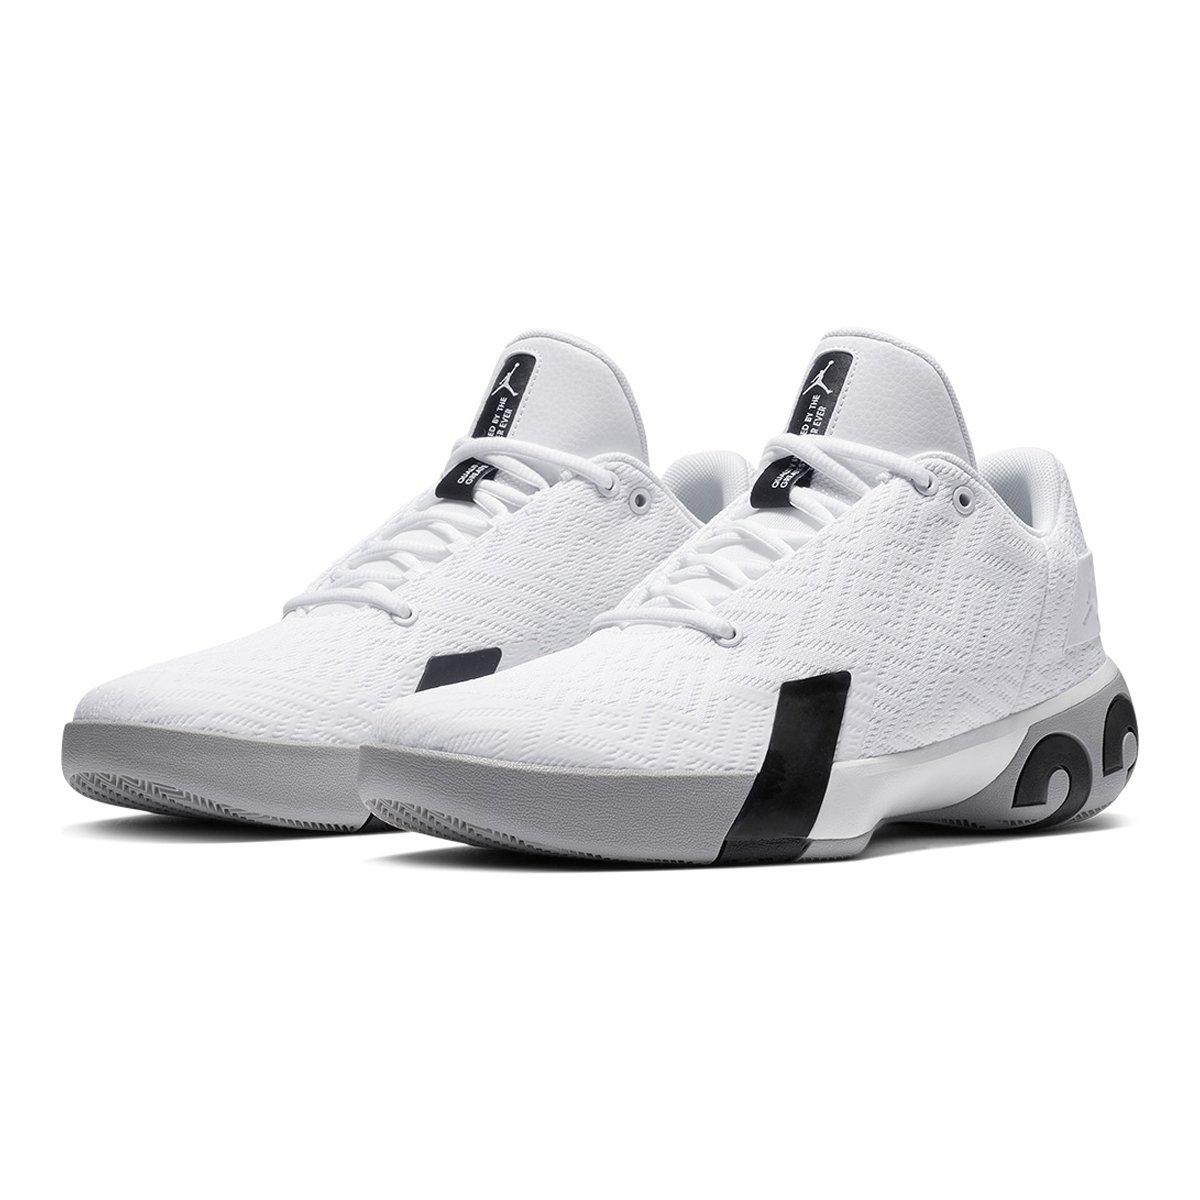 Tênis Nike Jordan Ultra Fly 3 Low Masculino - Branco e Preto ... a946daaae8cd3